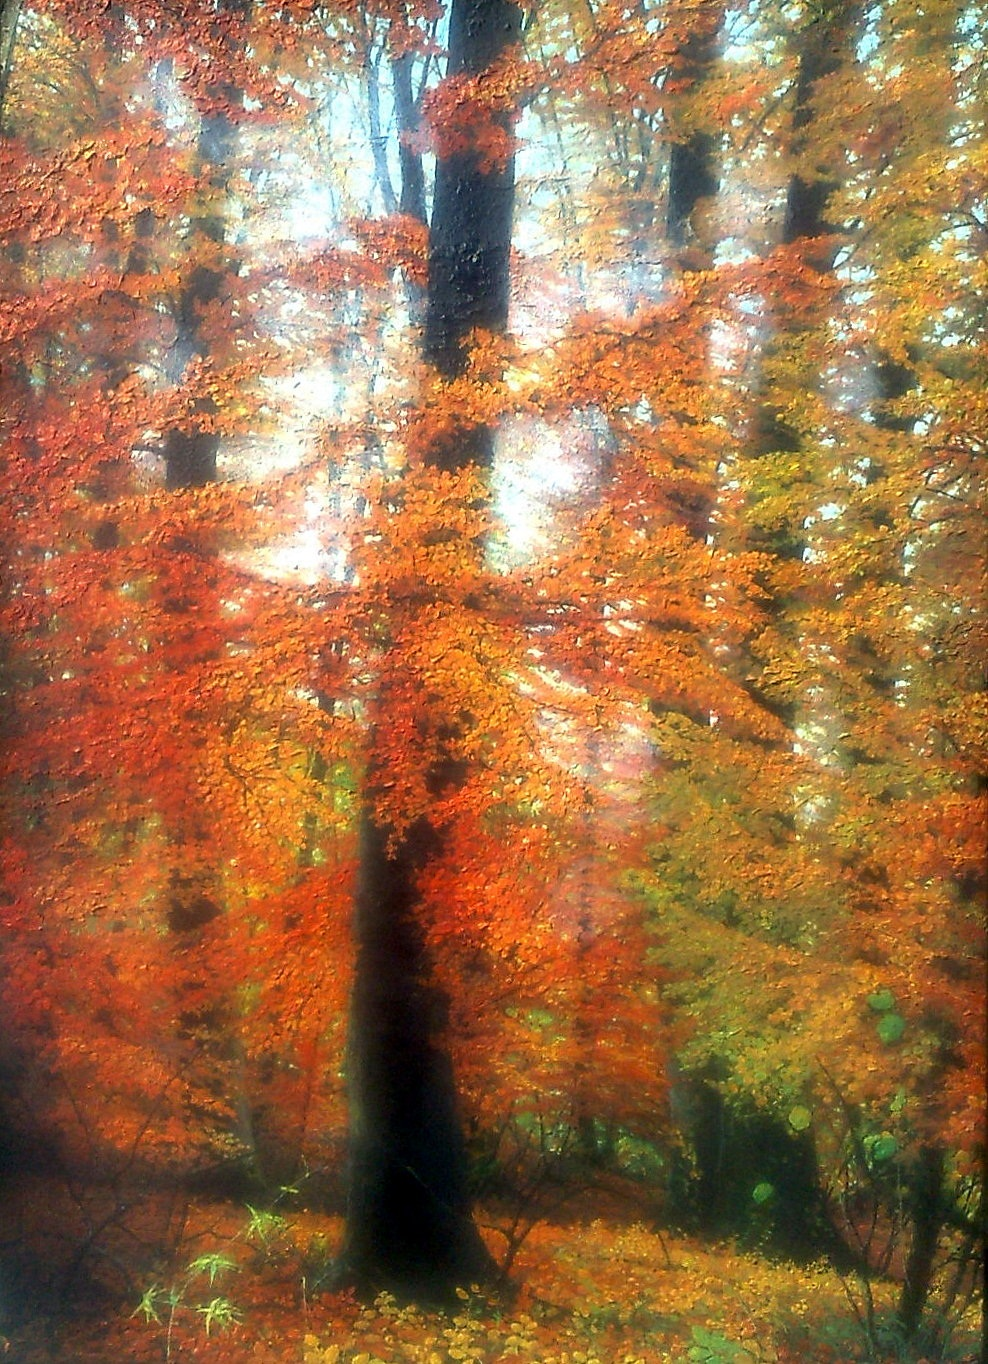 EUROPEAN BEECH I - Illustration (landscape); Book cover - Oil on wood - 19,69 X 13,39 in.jpg